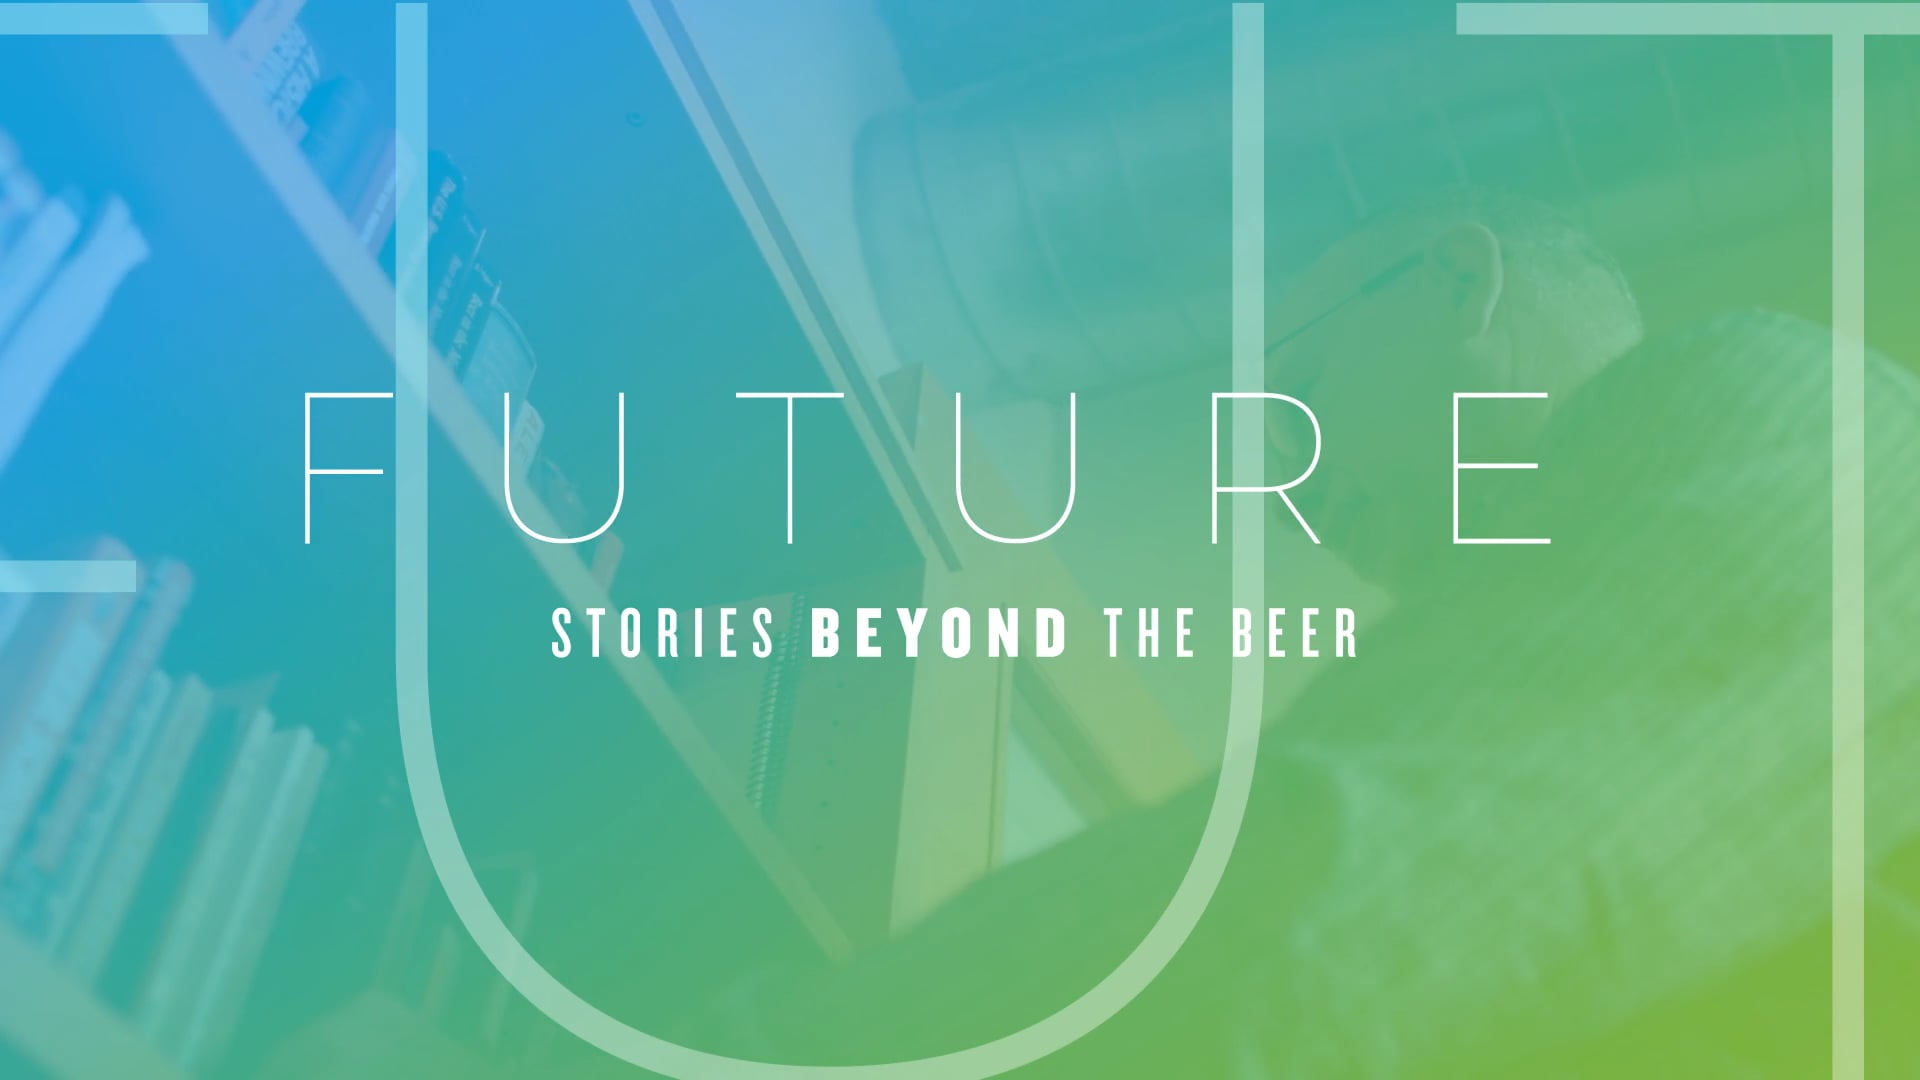 F U T U R E // Stories Beyond the Beer